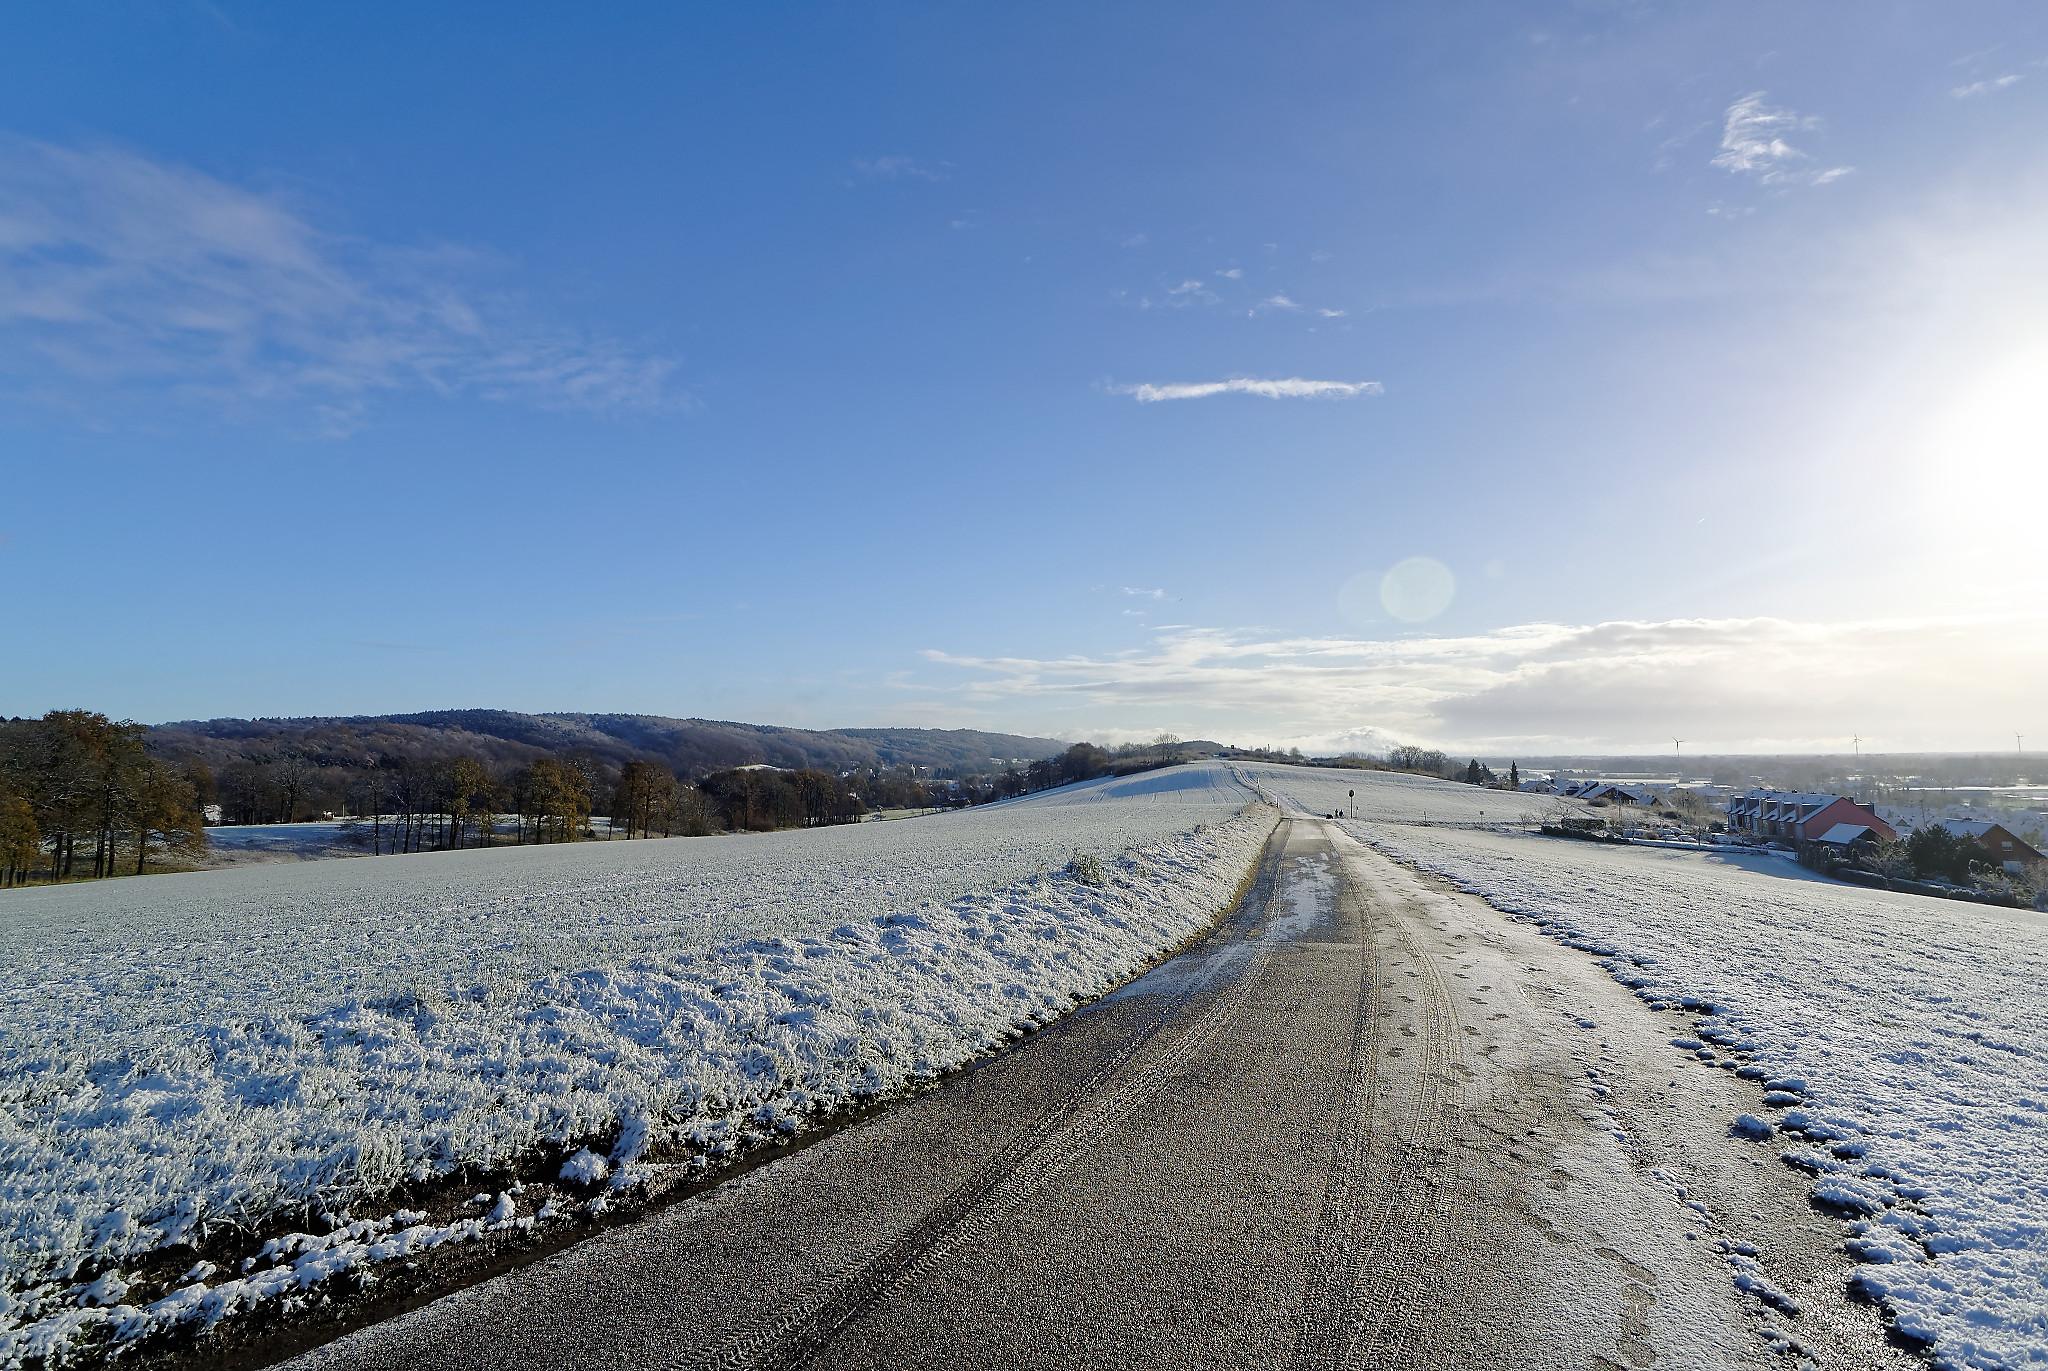 Schnee Brochterbeck